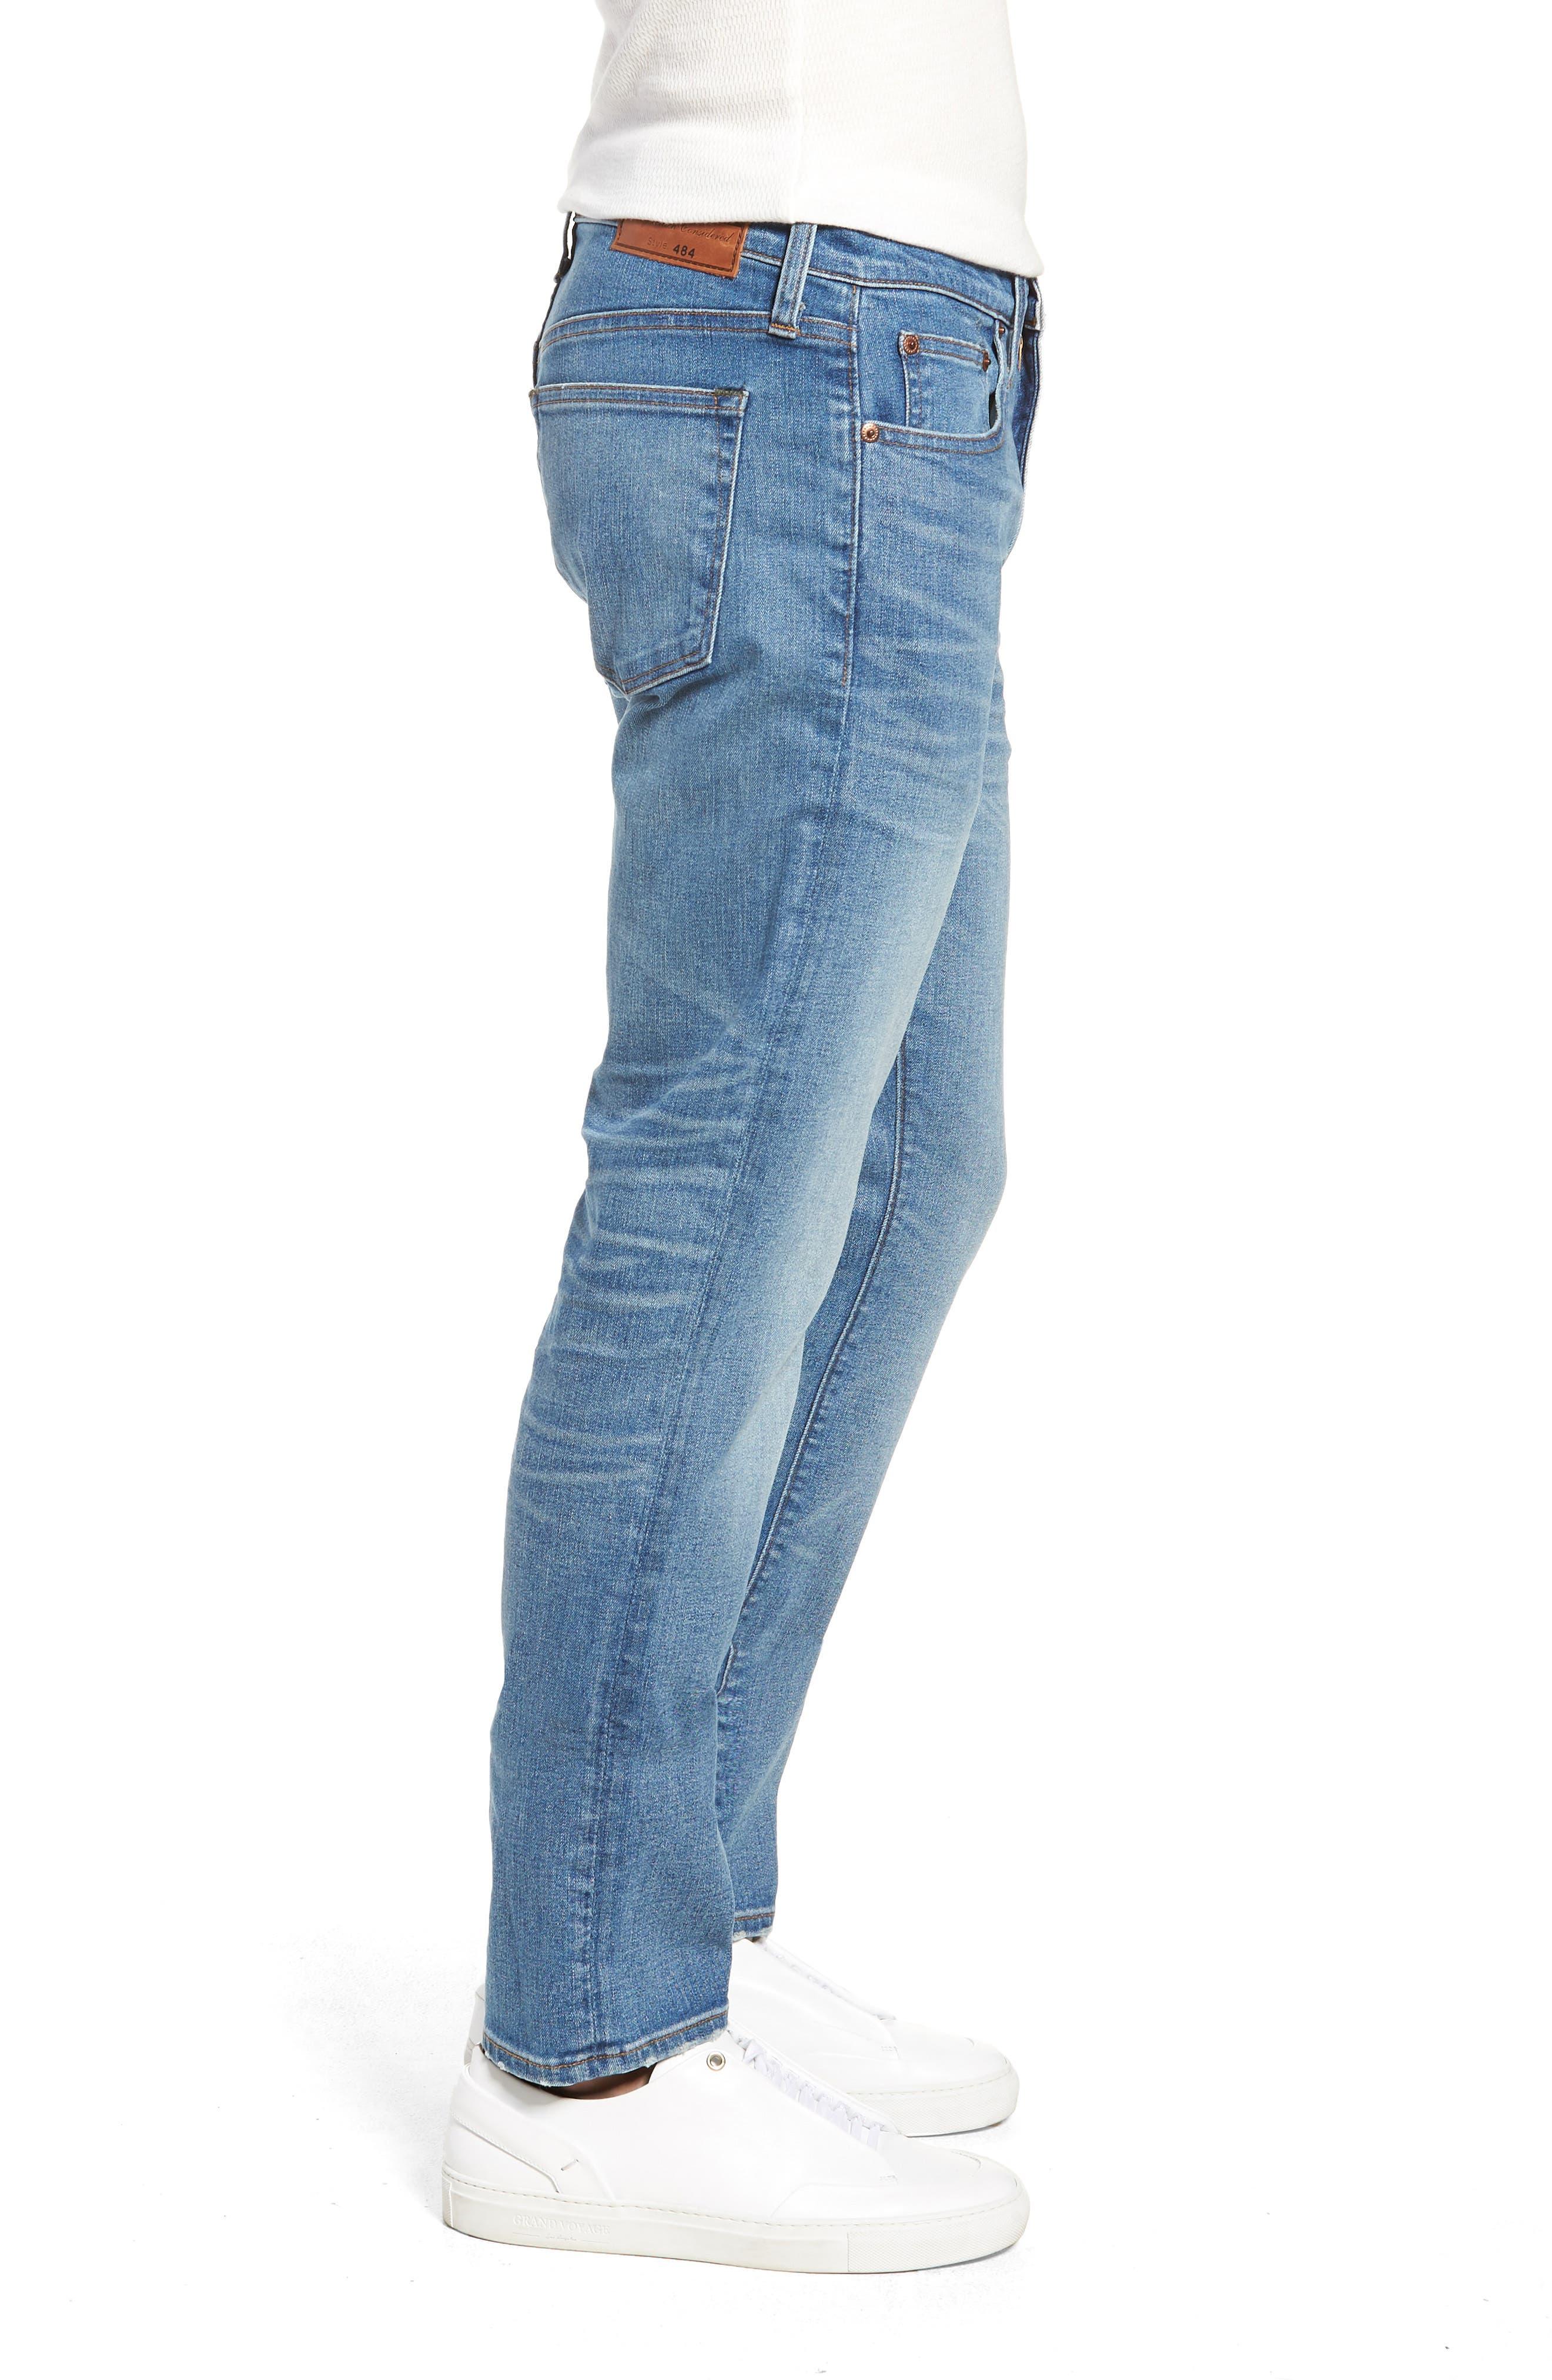 484 Slim Fit Distressed Stretch Jeans,                             Alternate thumbnail 3, color,                             STOCKTON WASH